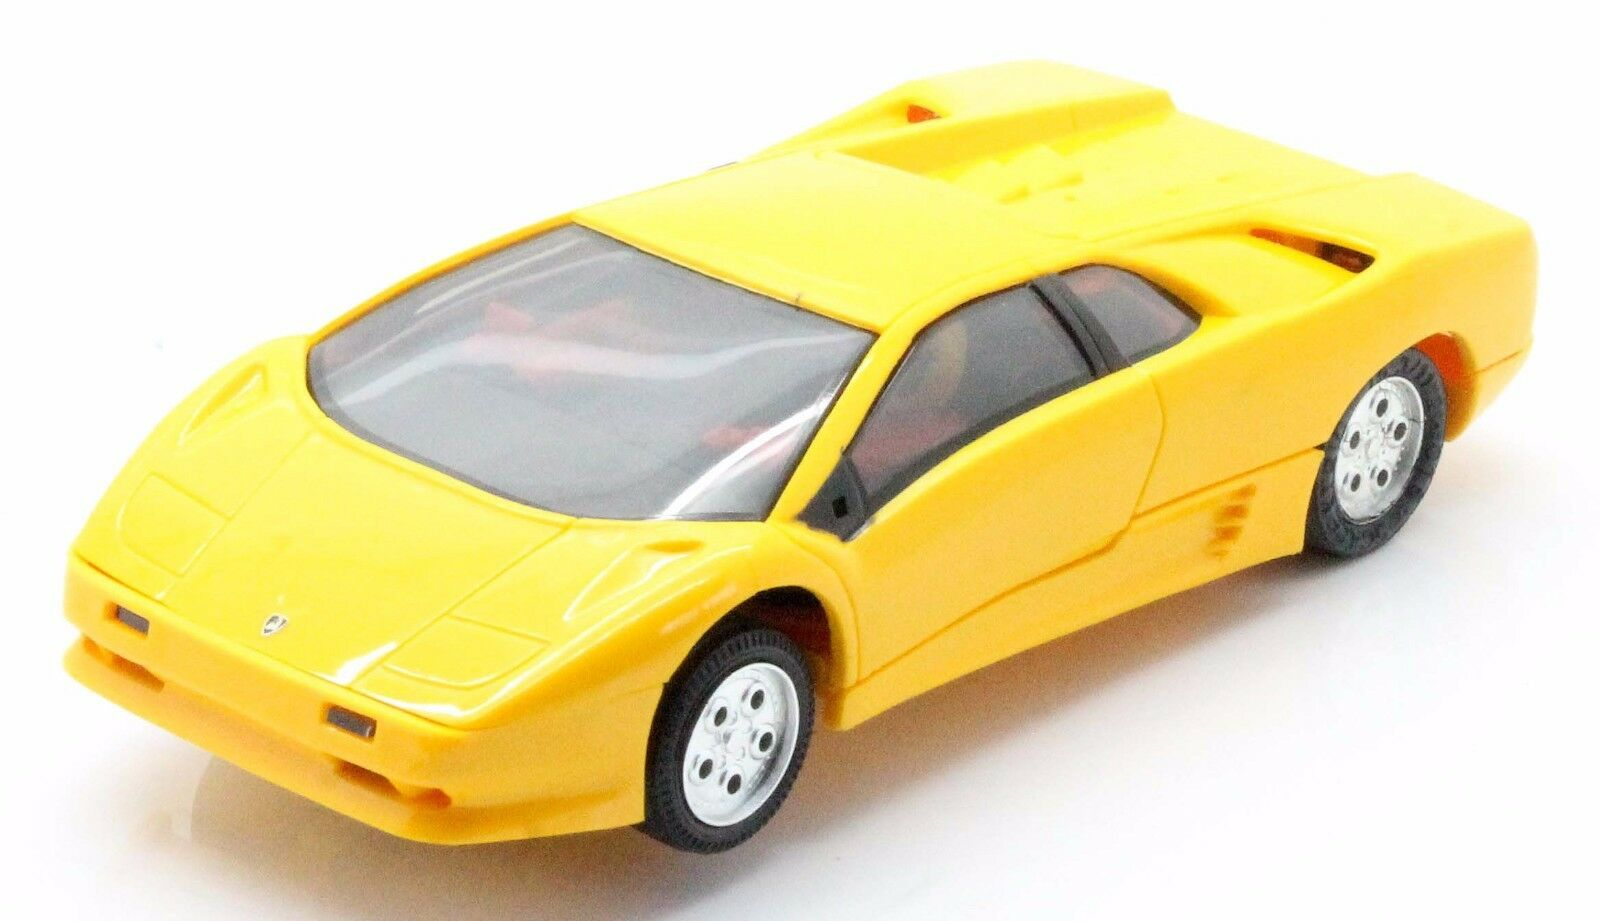 Scalextric C127 Lamborghini Diablo Racing Car 4e Oudflr5713 Toys